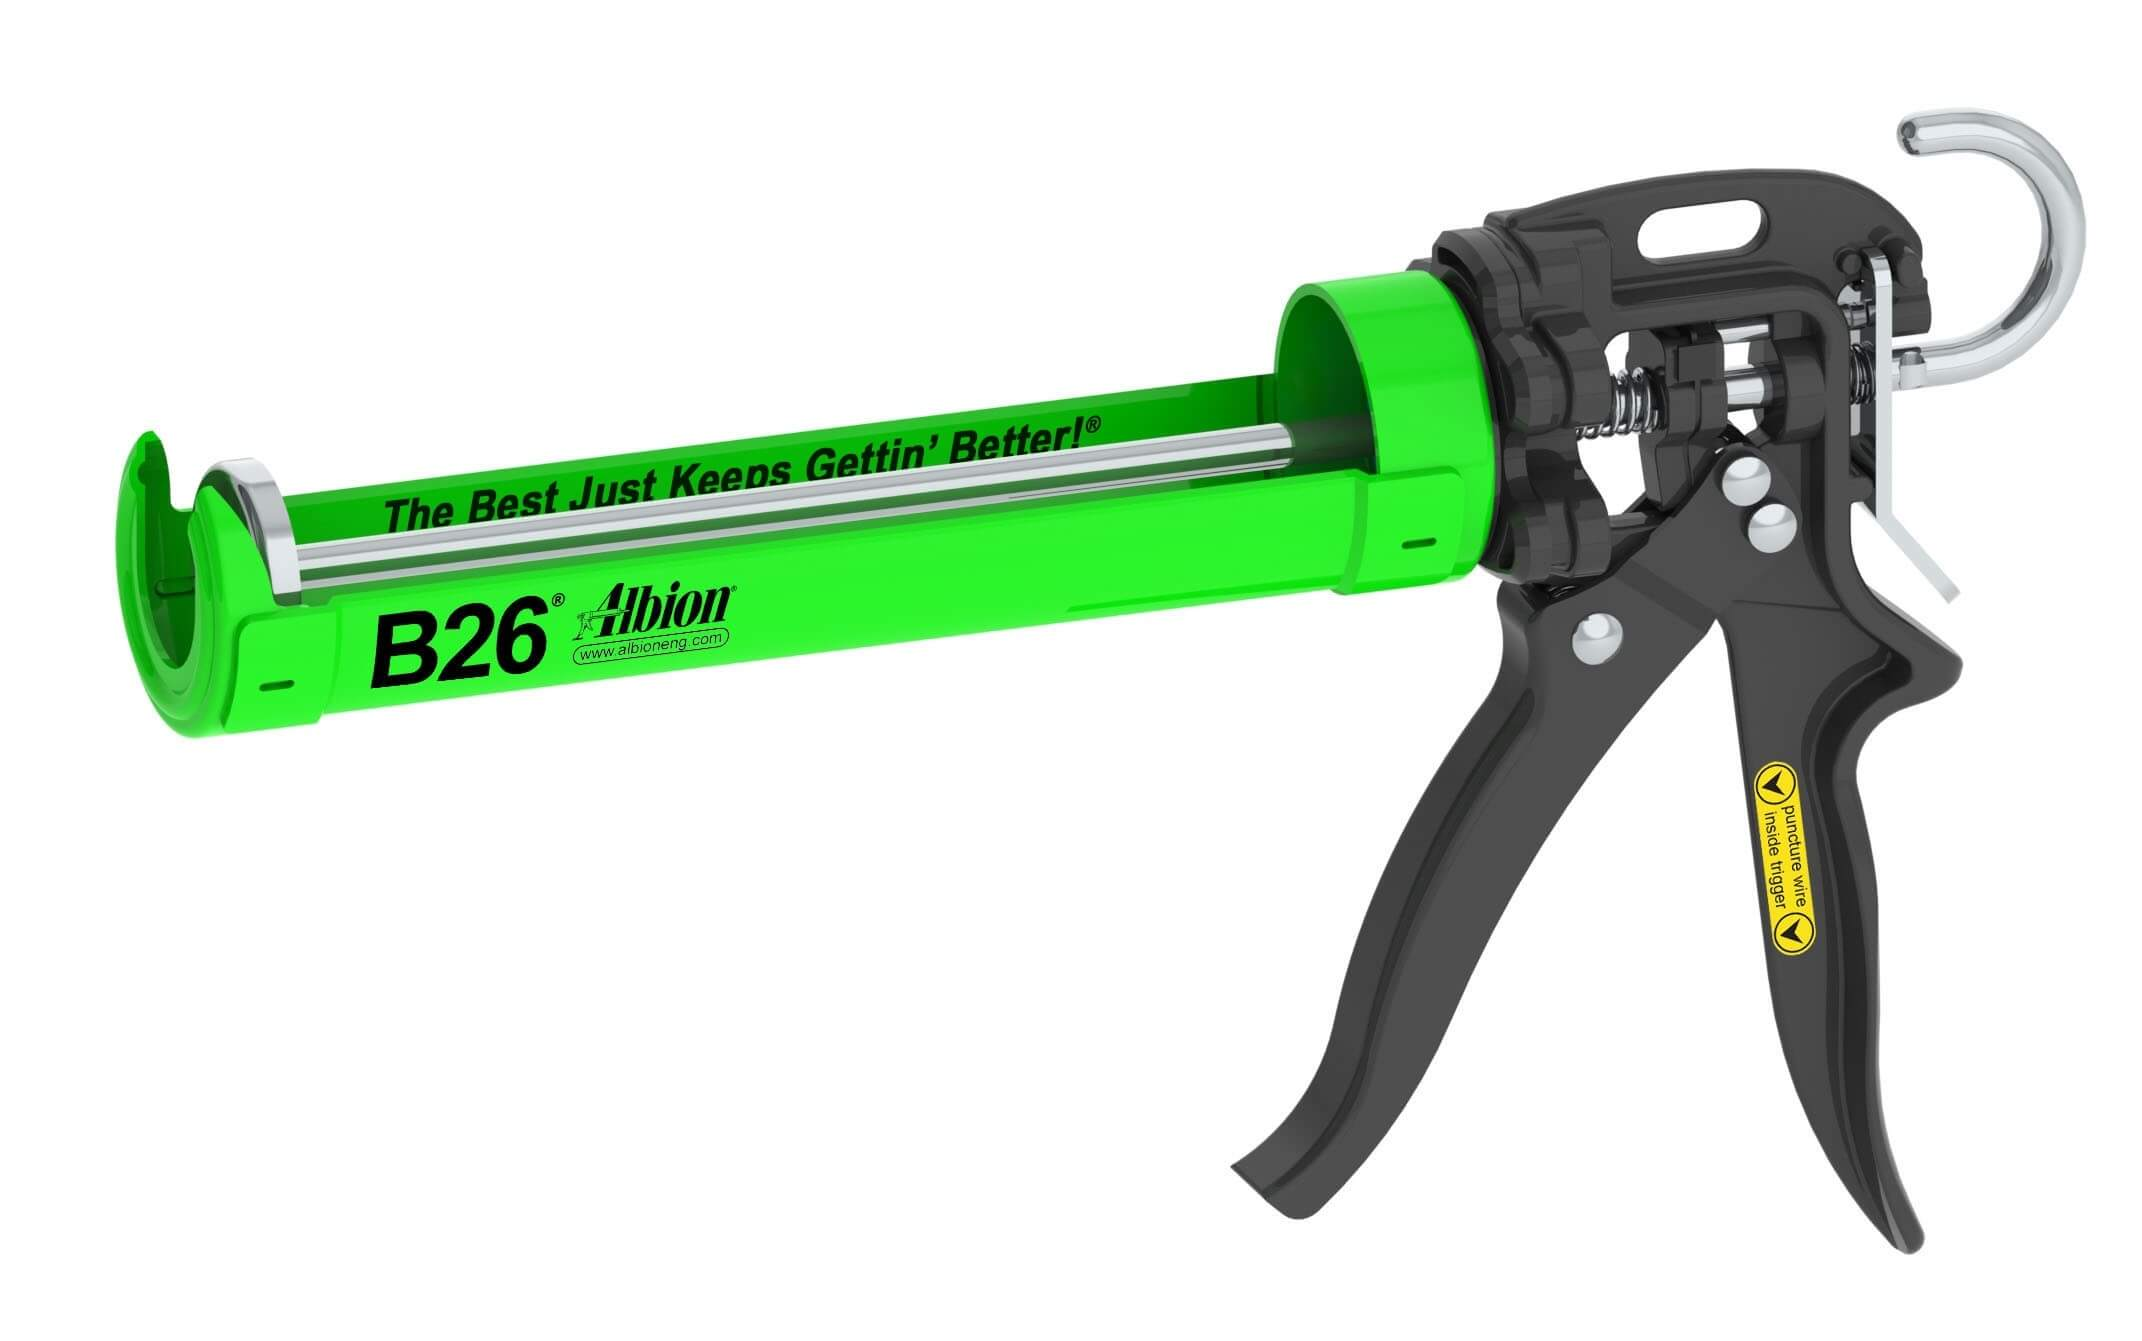 Albion B26 Caulk Gun for 10.1 ounce cartridges - 26:1 thrust ratio